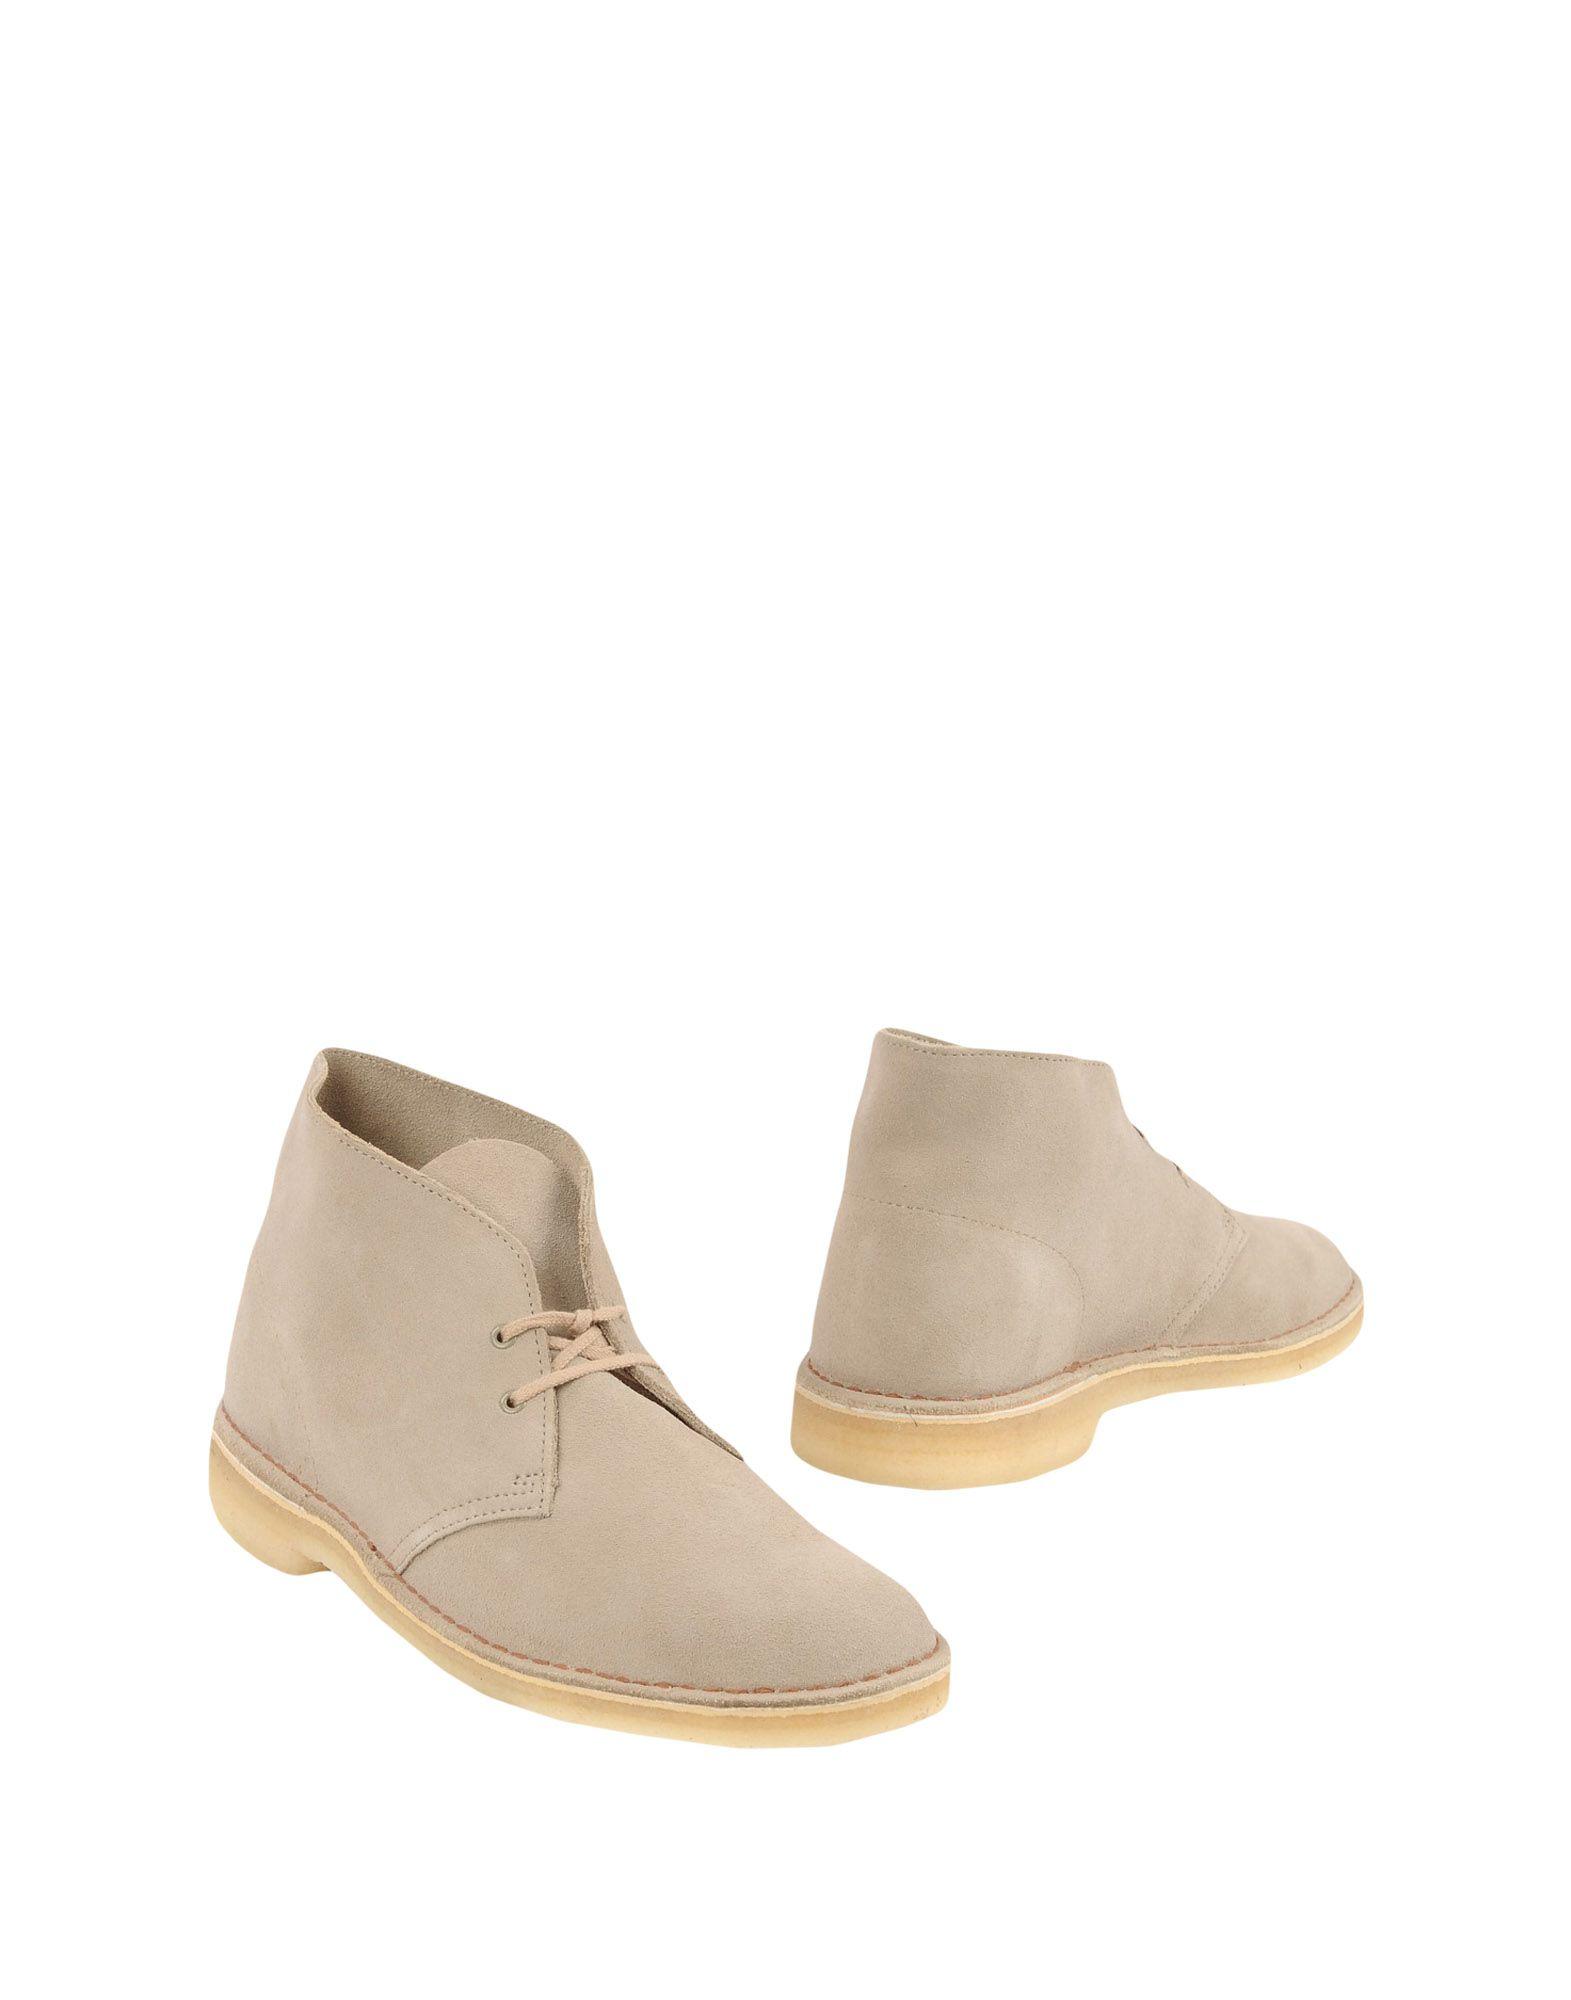 CLARKS ORIGINALS Полусапоги и высокие ботинки clarks originals